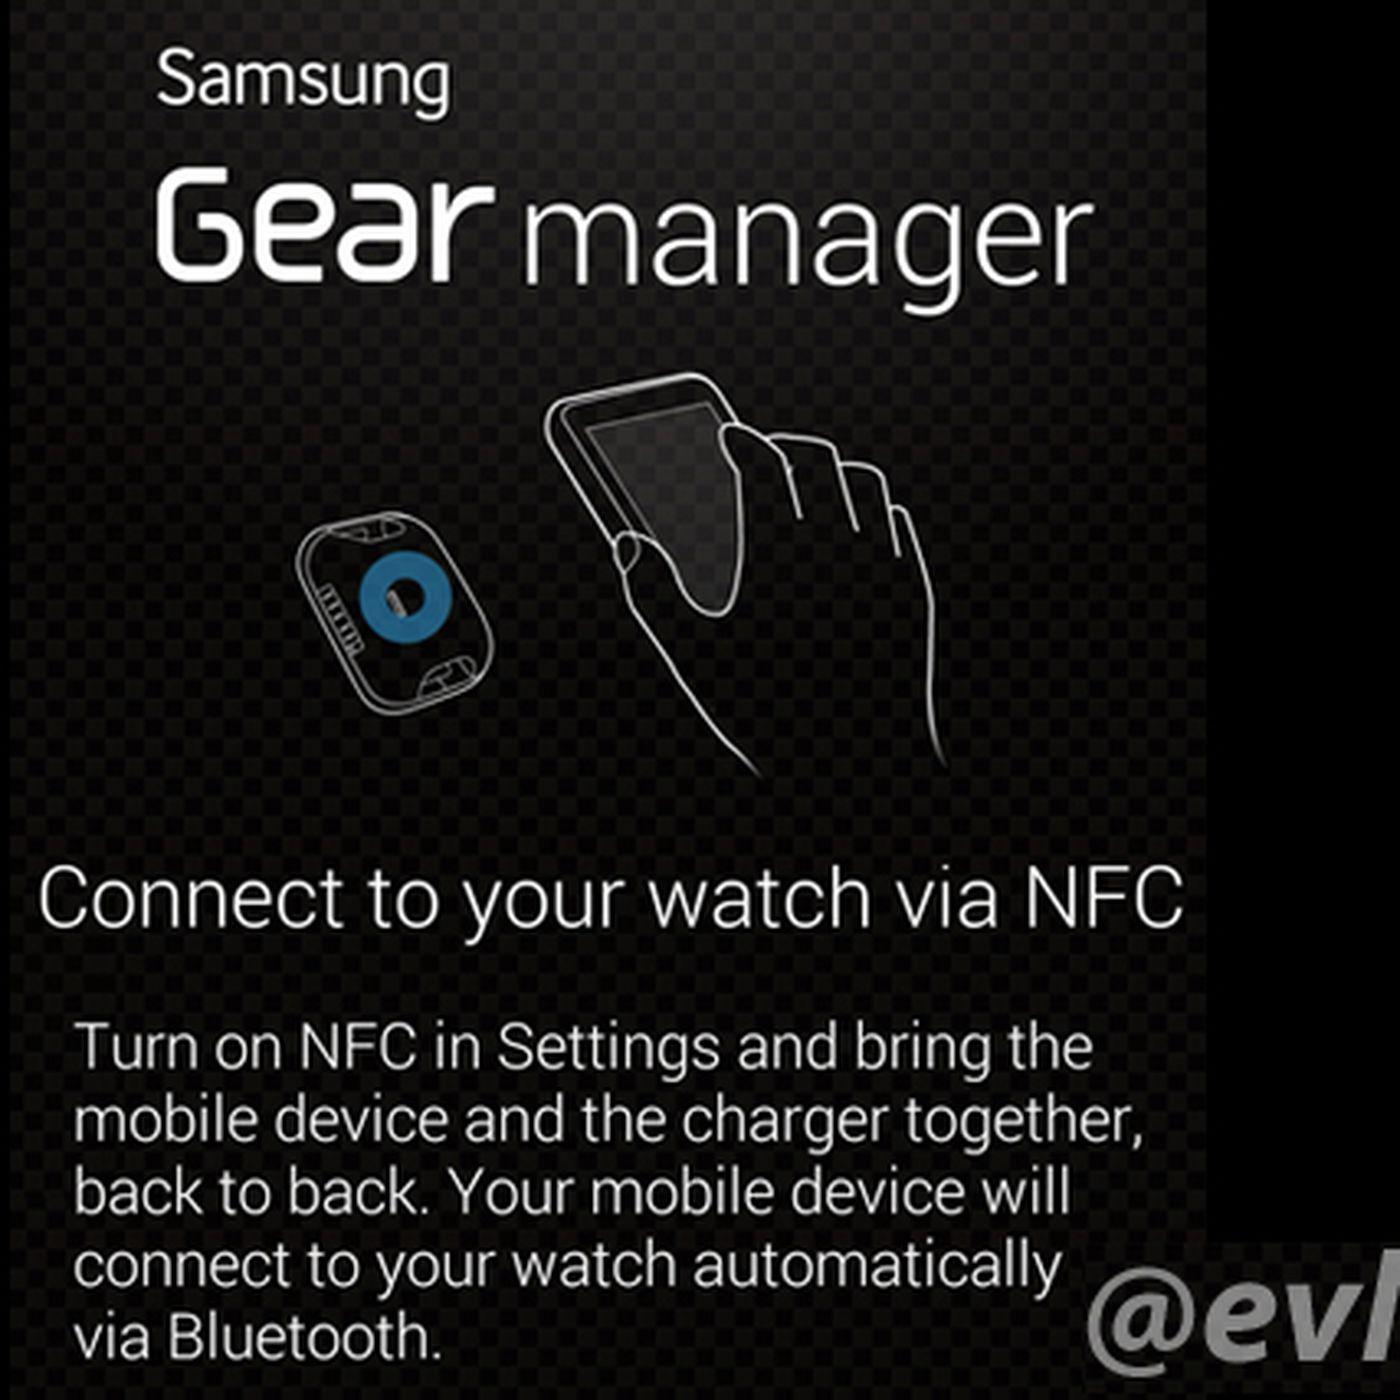 Samsung Galaxy Gear smartwatch app detailed in leaked